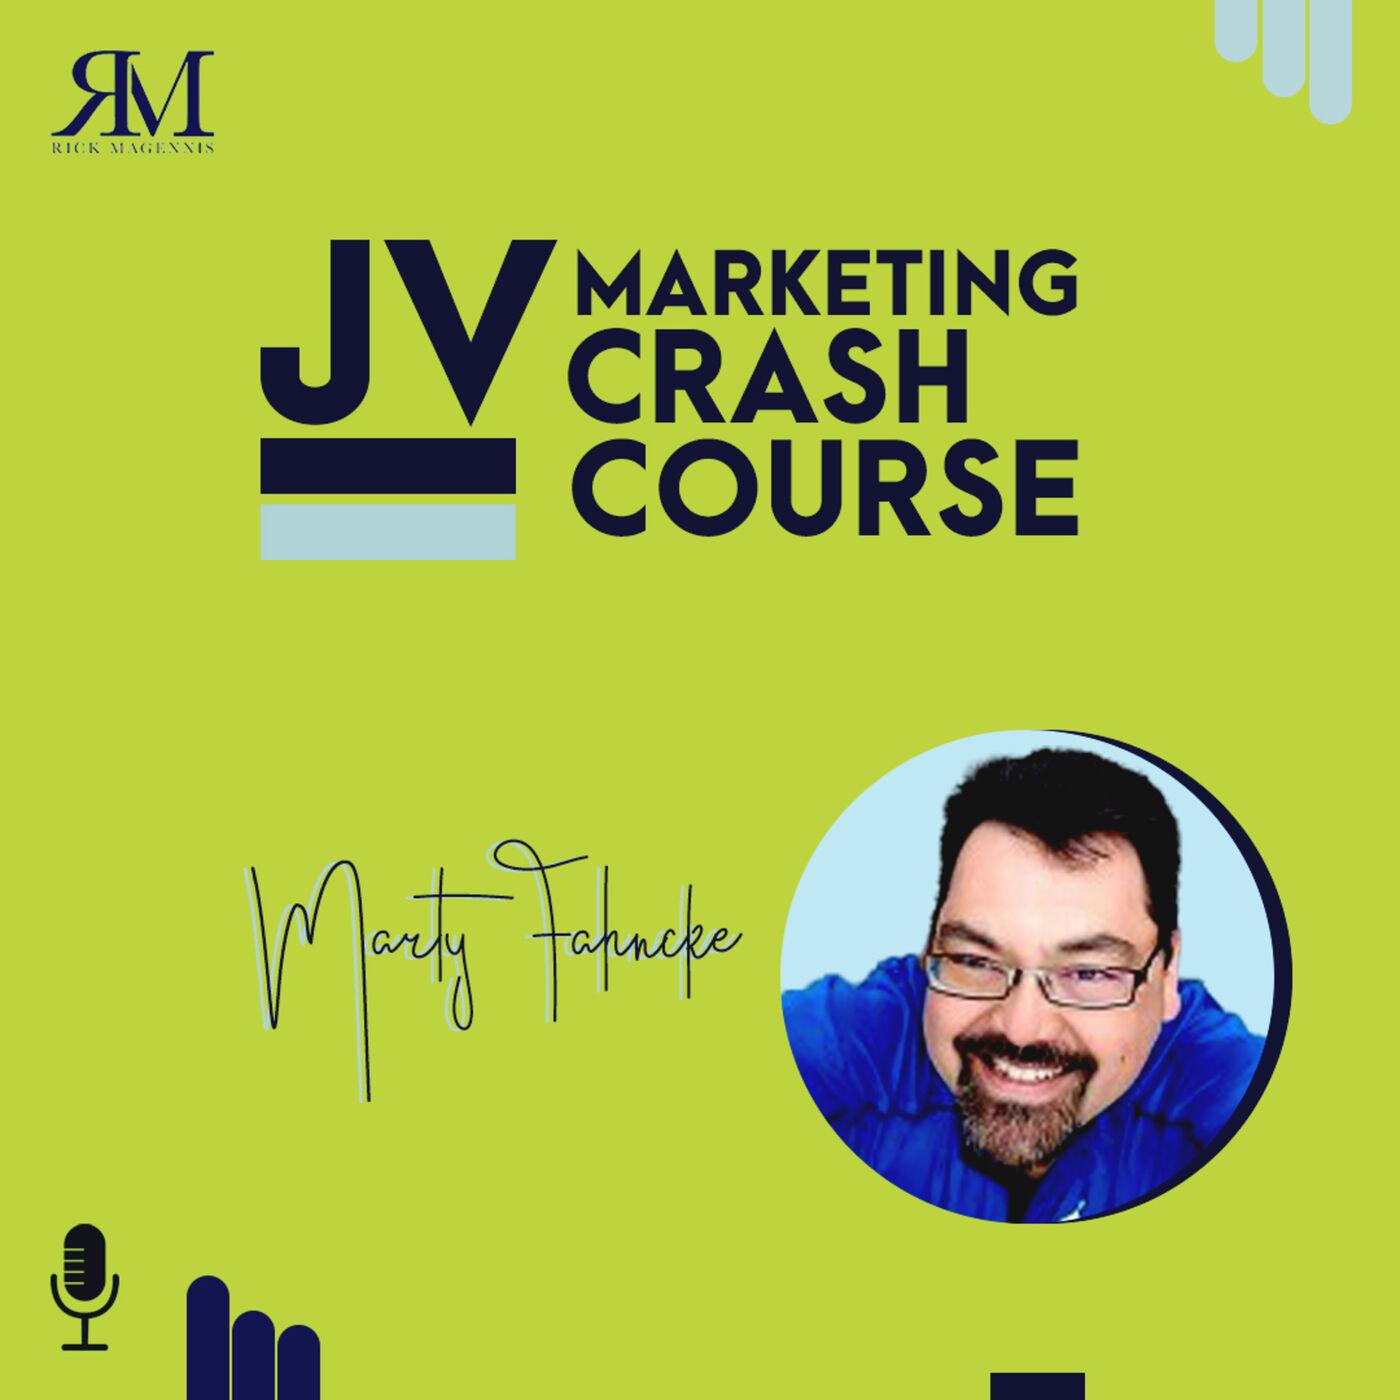 JV Marketing Crash Course